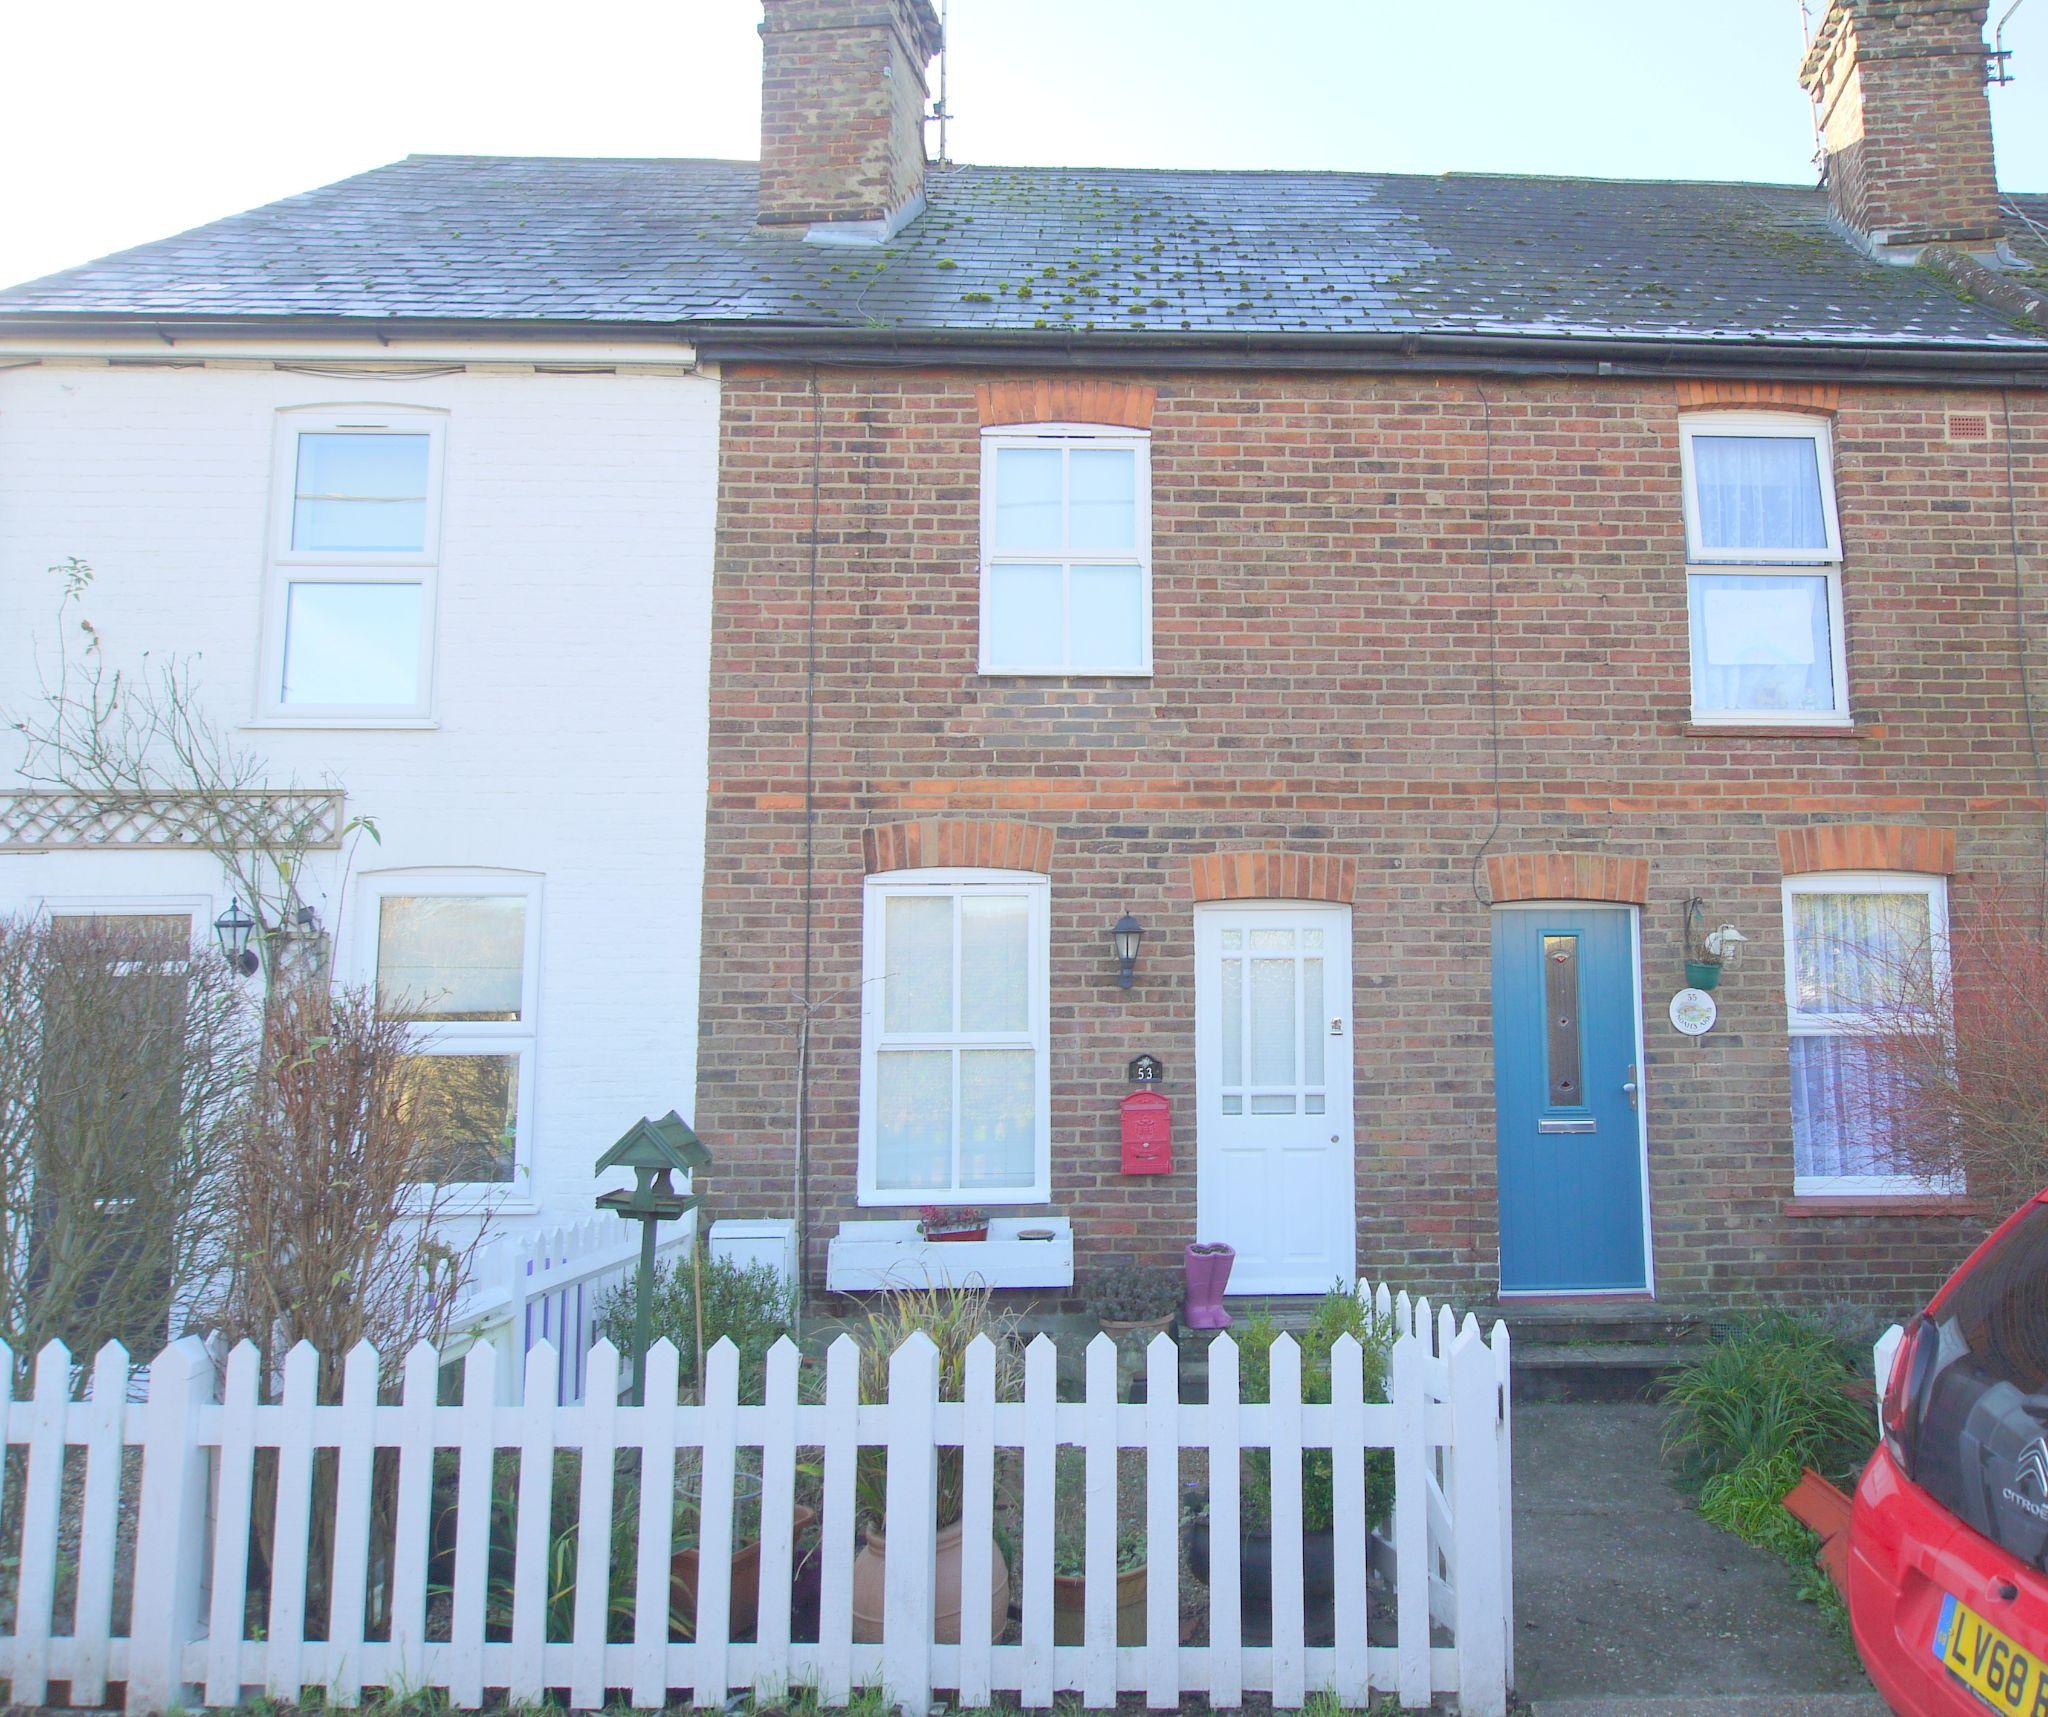 2 bedroom mid terraced house Sold in Sevenoaks - Photograph 1